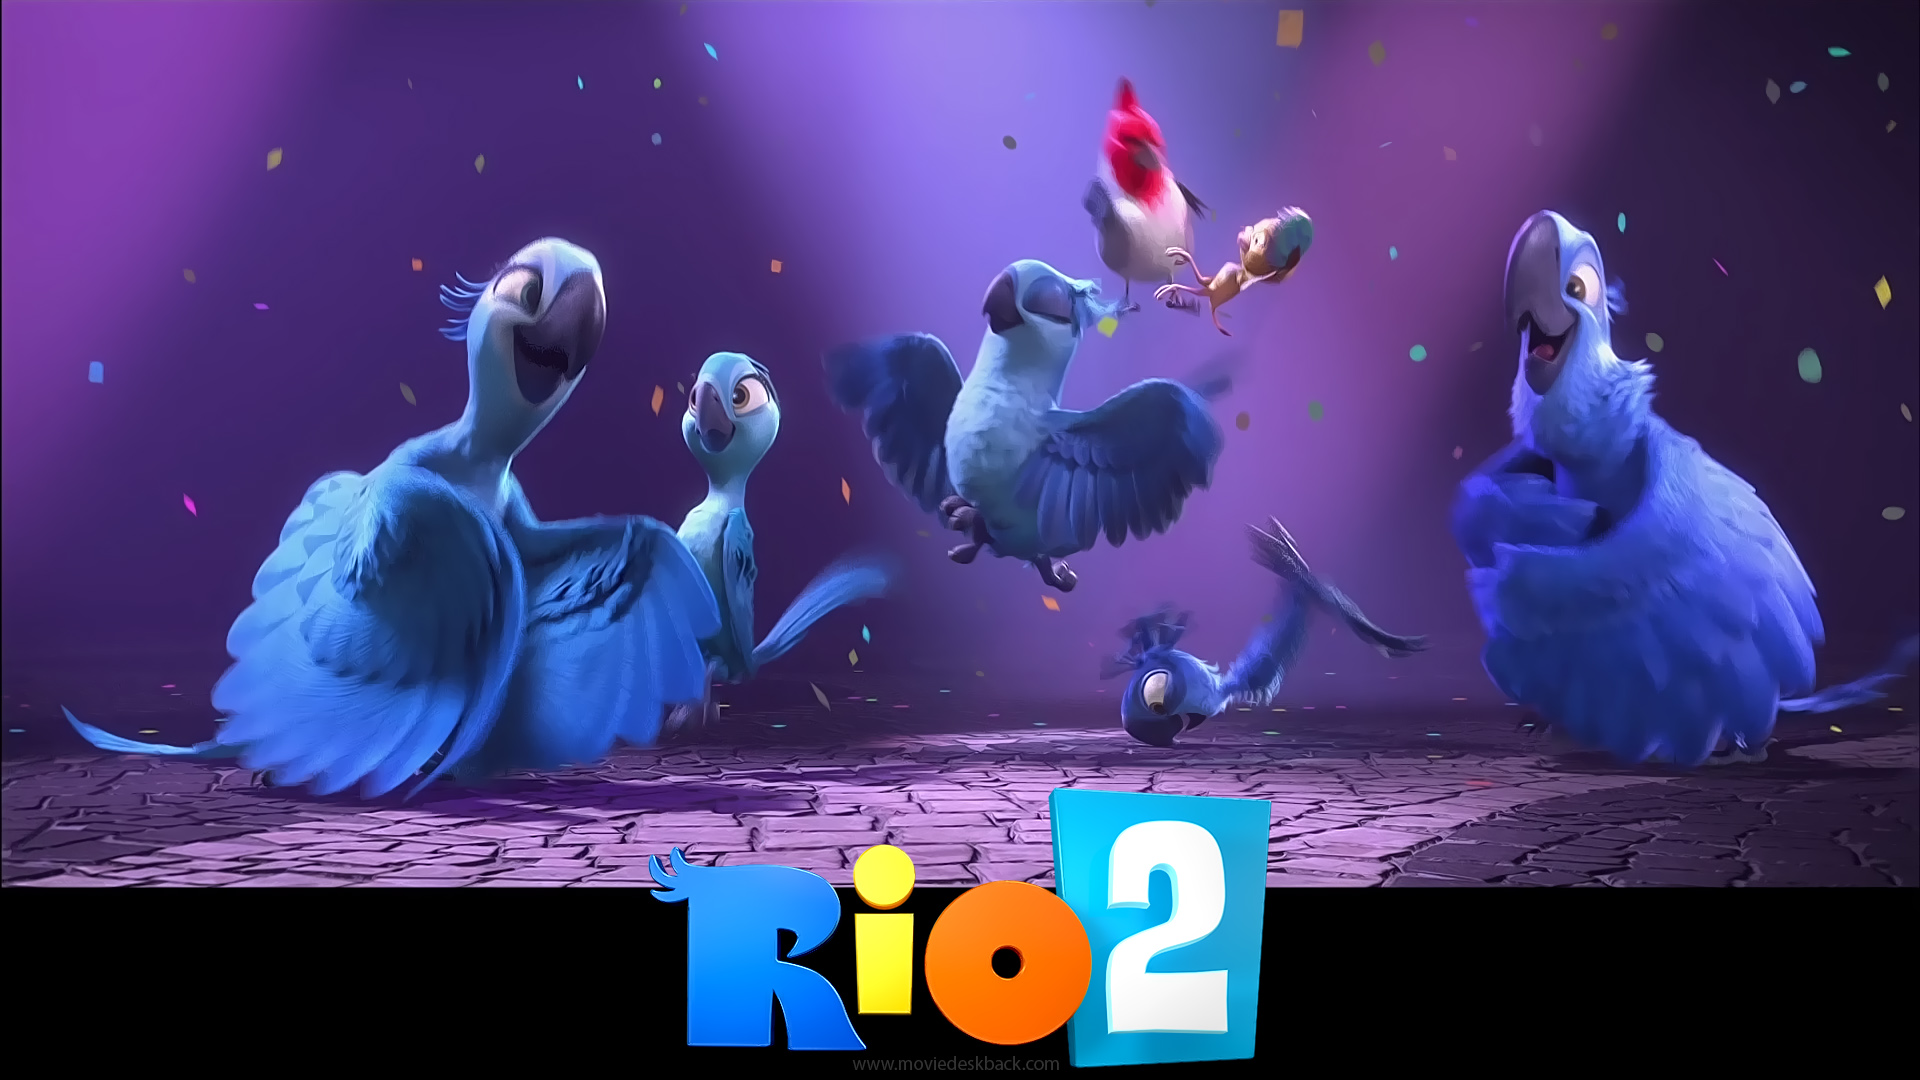 image - download-rio-2-wallpaper-   rio wiki   fandom powered